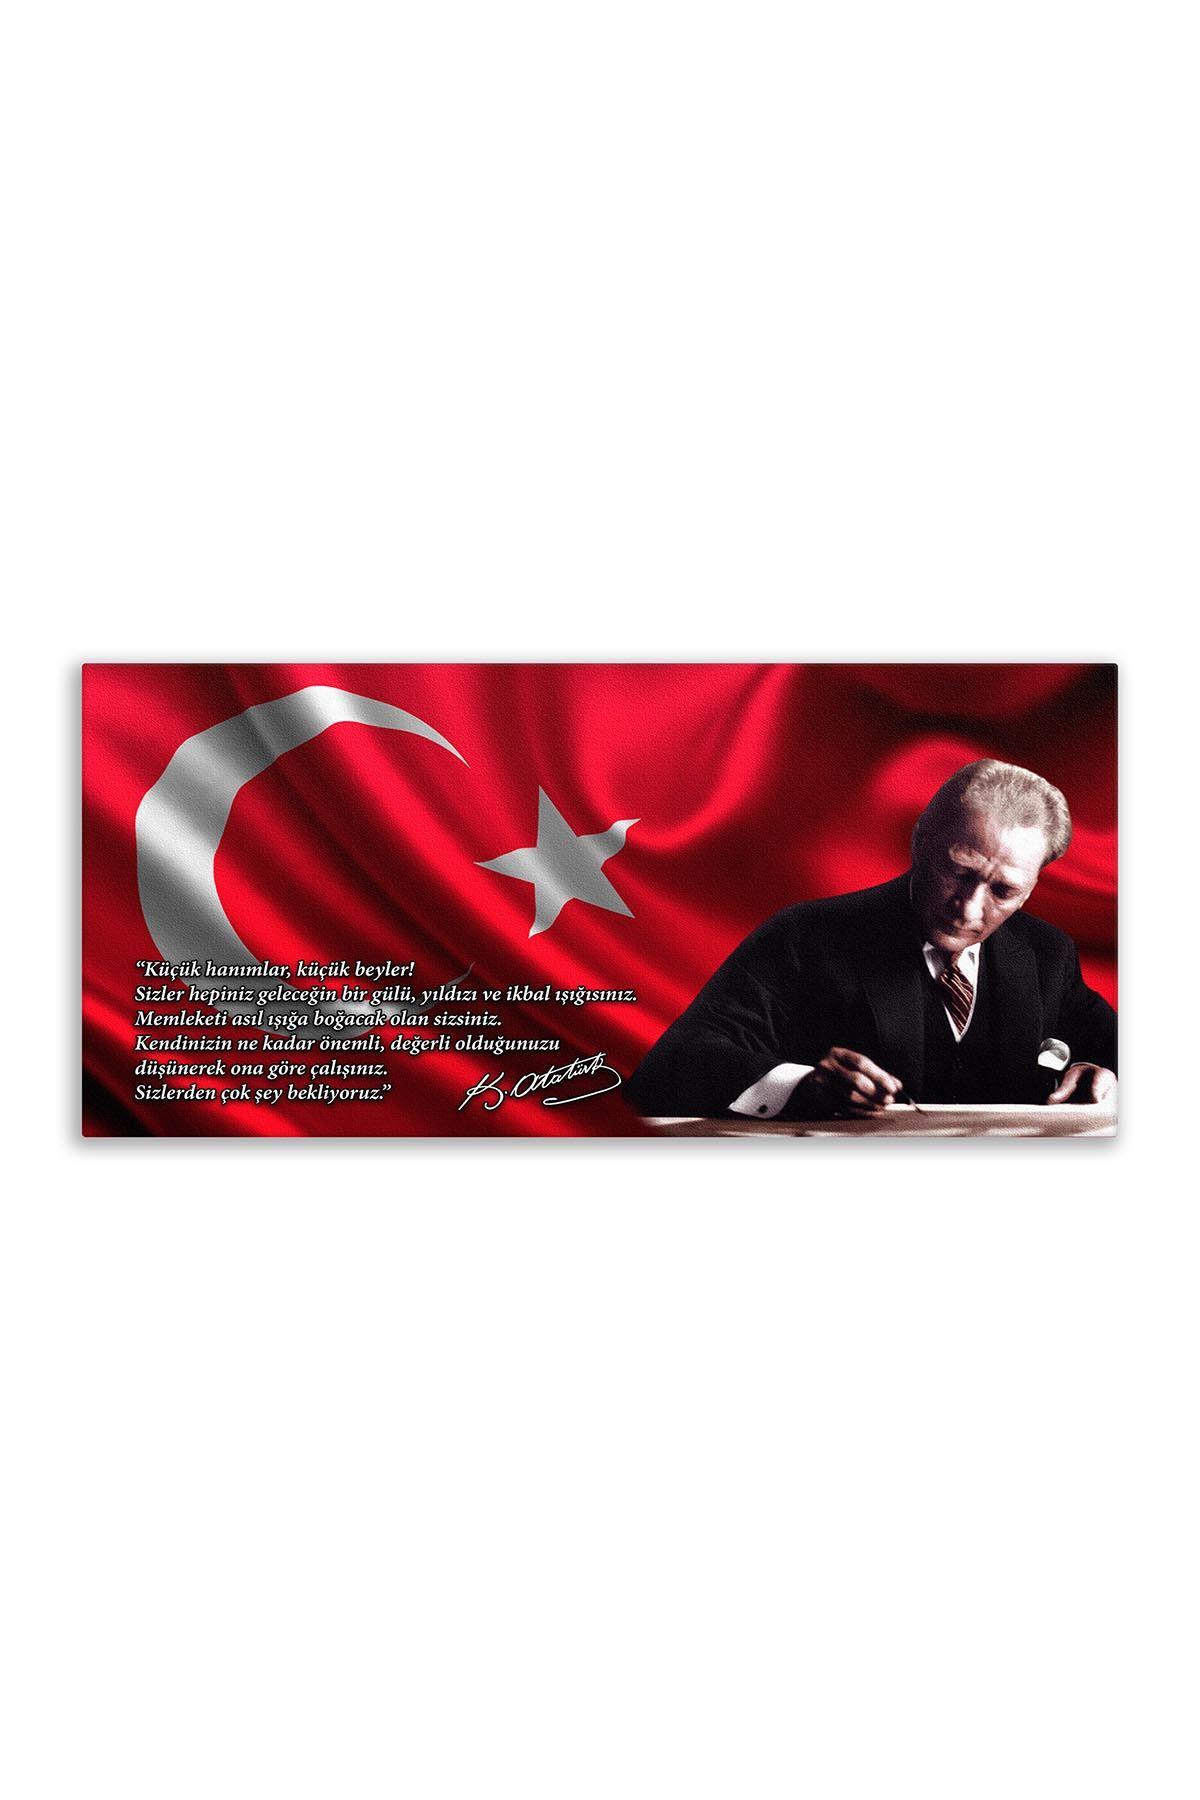 Atatürk Canvas Board | Printed Canvas Board | Customized Board |Digital Printing